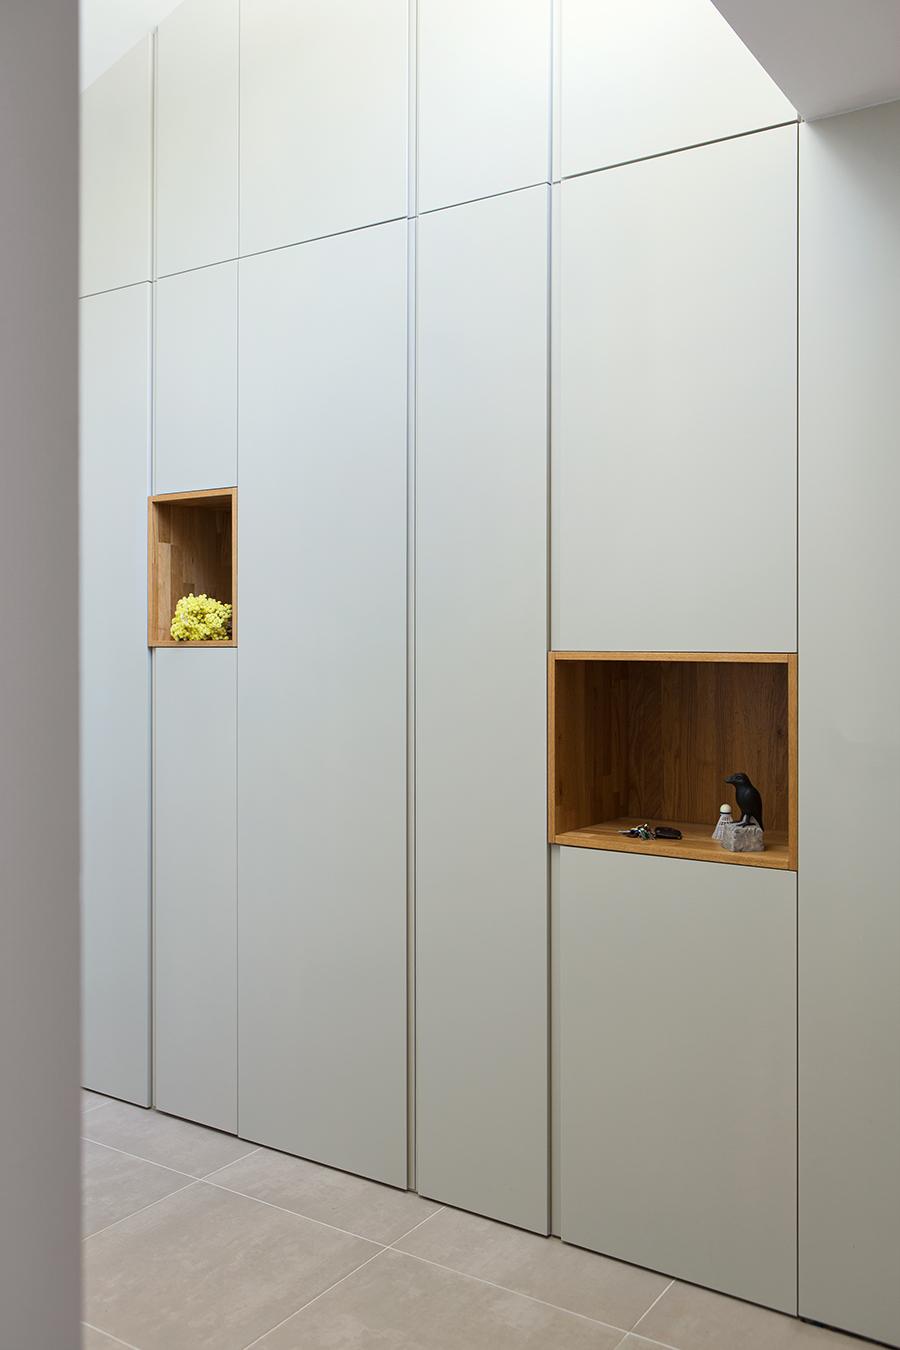 arch-Kombinat_foto -Ilovar&Tancic_H MJ_omara vhod-wardrobe entrance_niša-niche_09